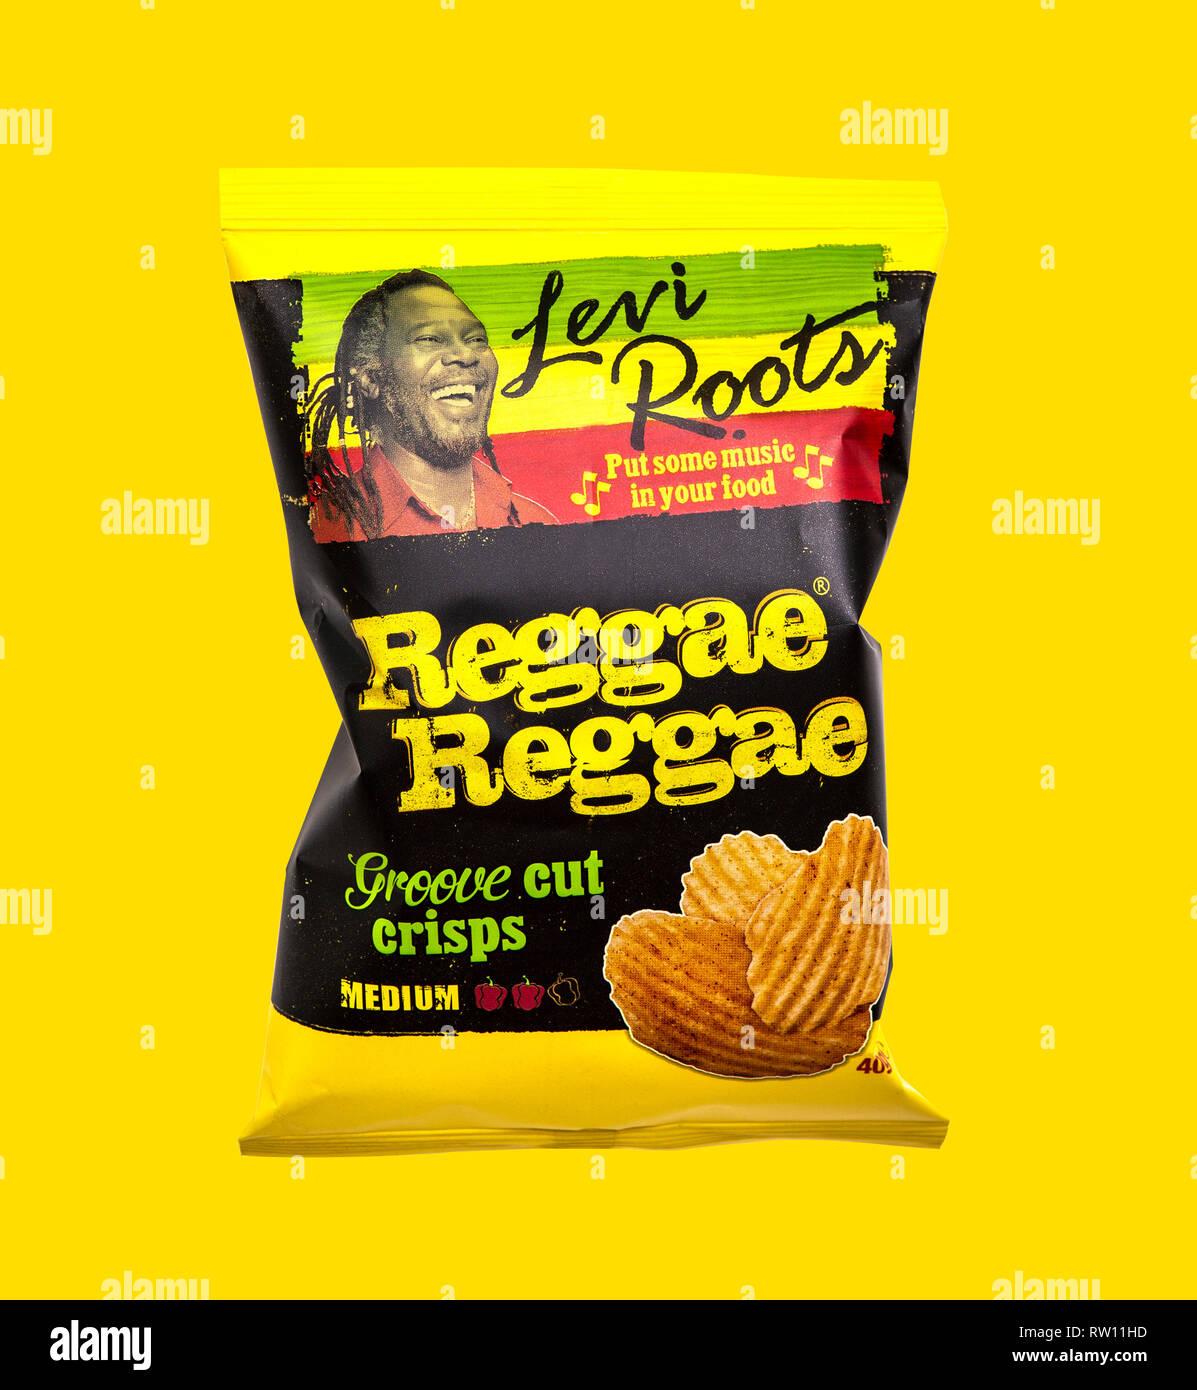 SWINDON, UK - MARCH 3, 2019: Levi Roots Reggae Reggae Groove cut crisps on a yellow background - Stock Image